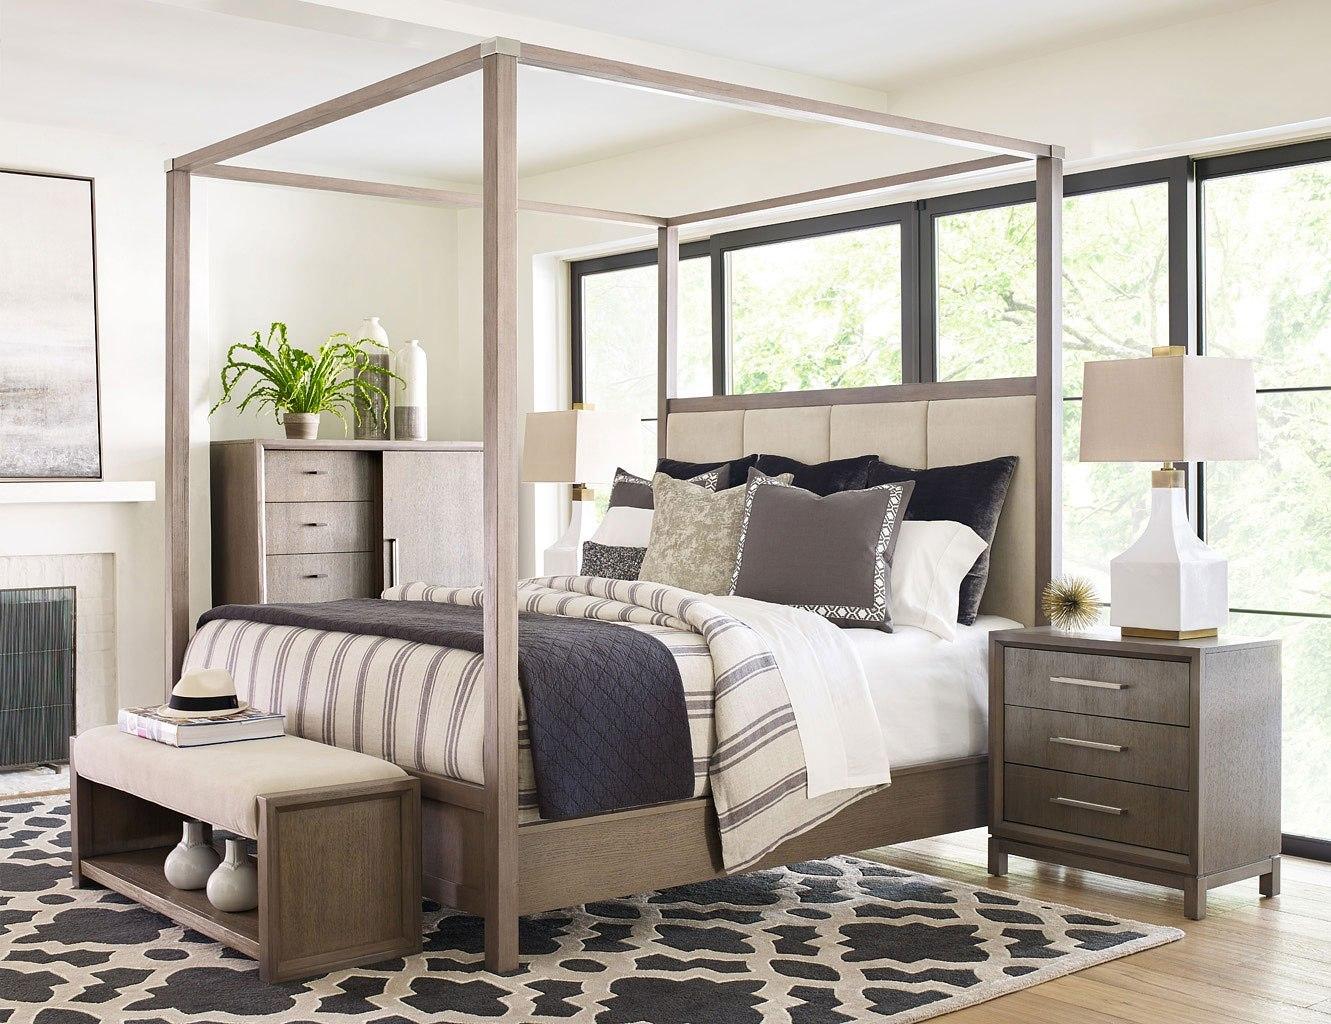 Sofa Set Price 6000